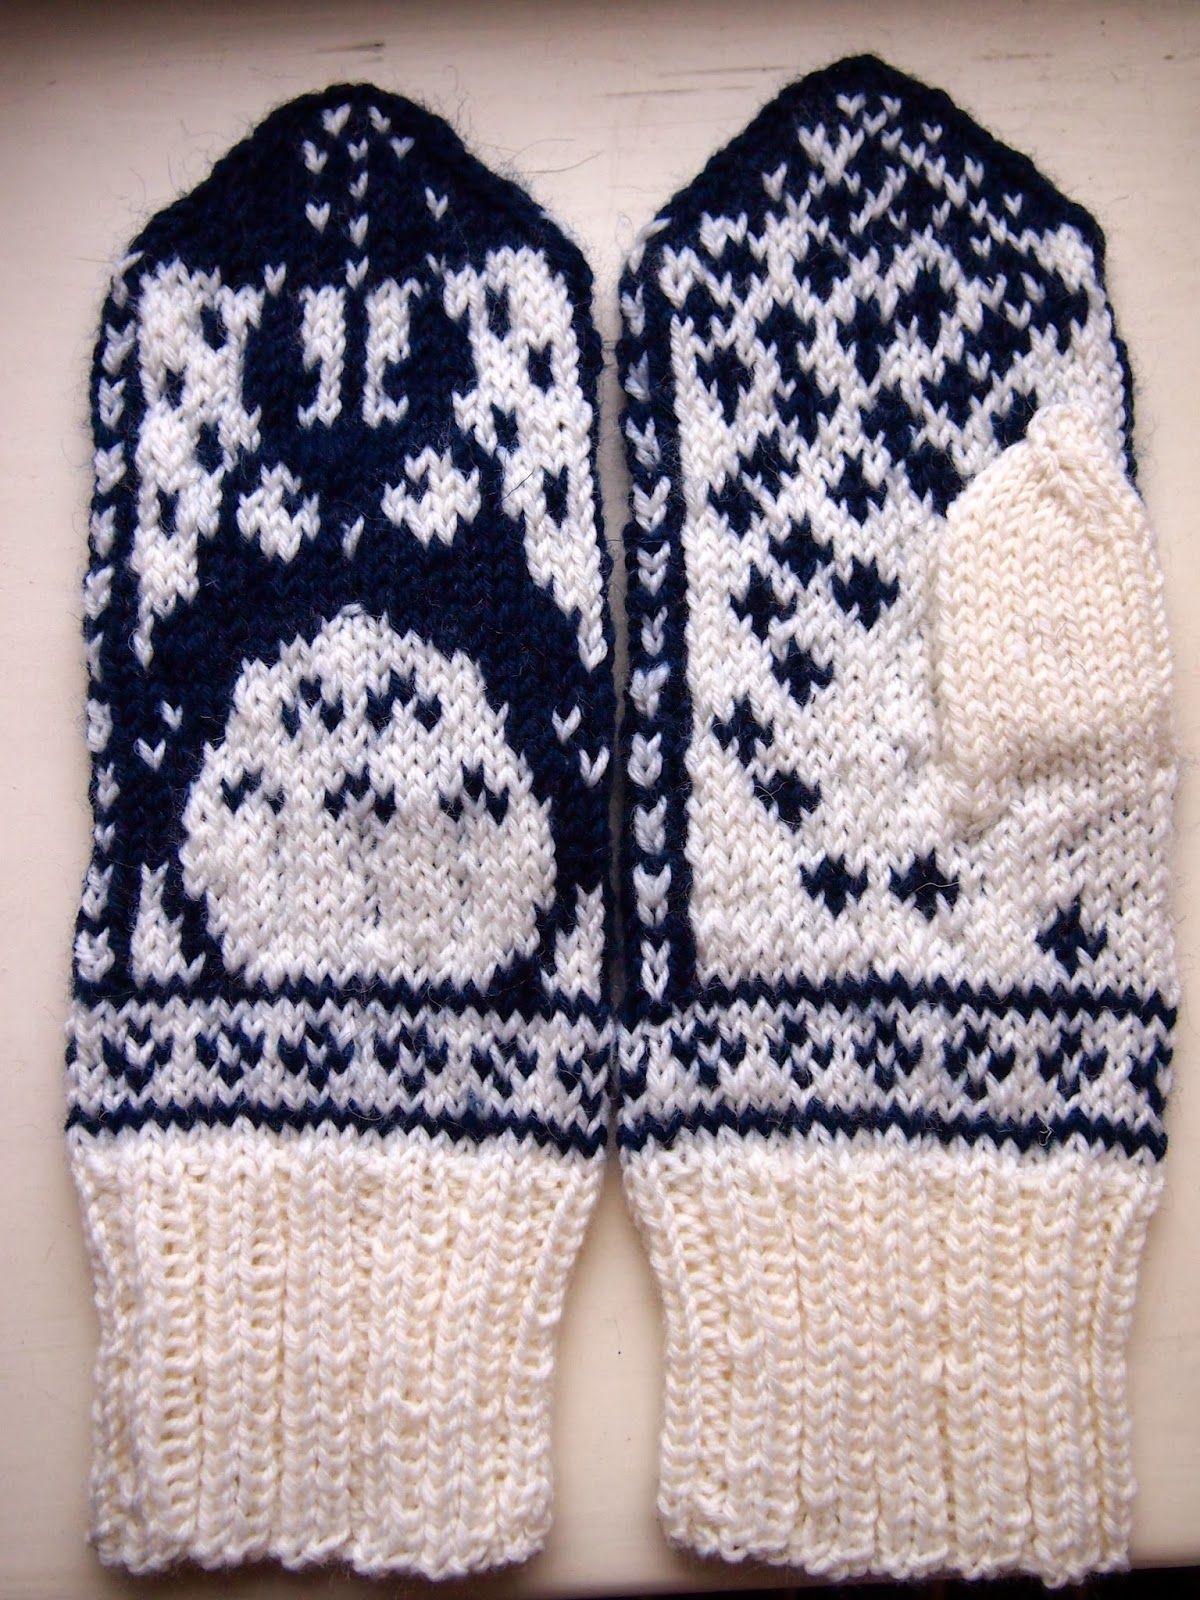 Tanssivat kädet - Dancing hands: Joululahjoja - Christmas presents